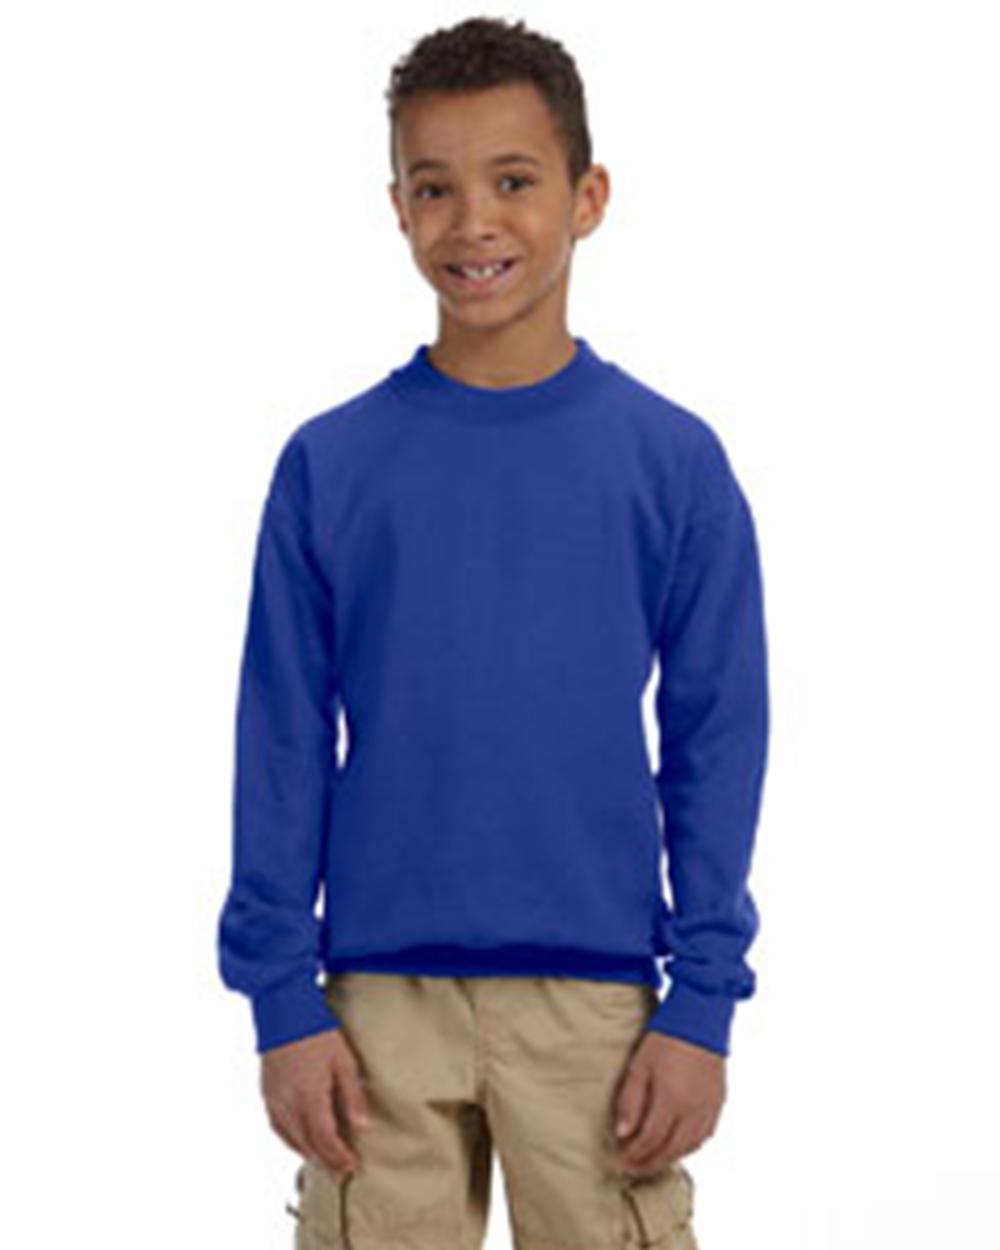 Youth Heavy Blend Crewneck Sweatshirt